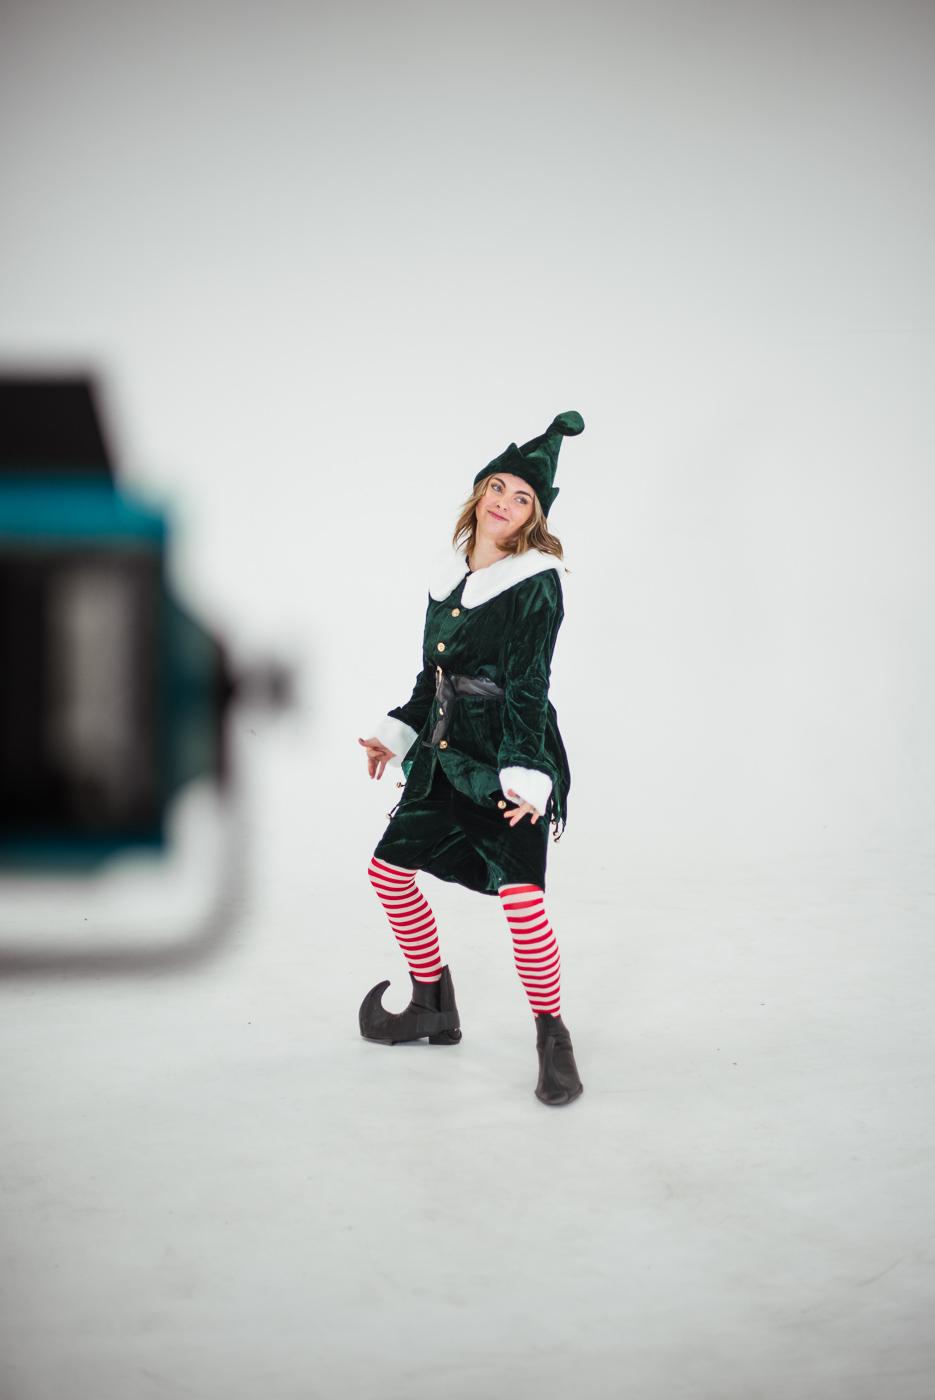 PHOCO Christmas Card The Articulate Photo Studio Cyclorama Infinity Wall Colorado Fort Collins Photographer Elf Yourself BTS-11.jpg